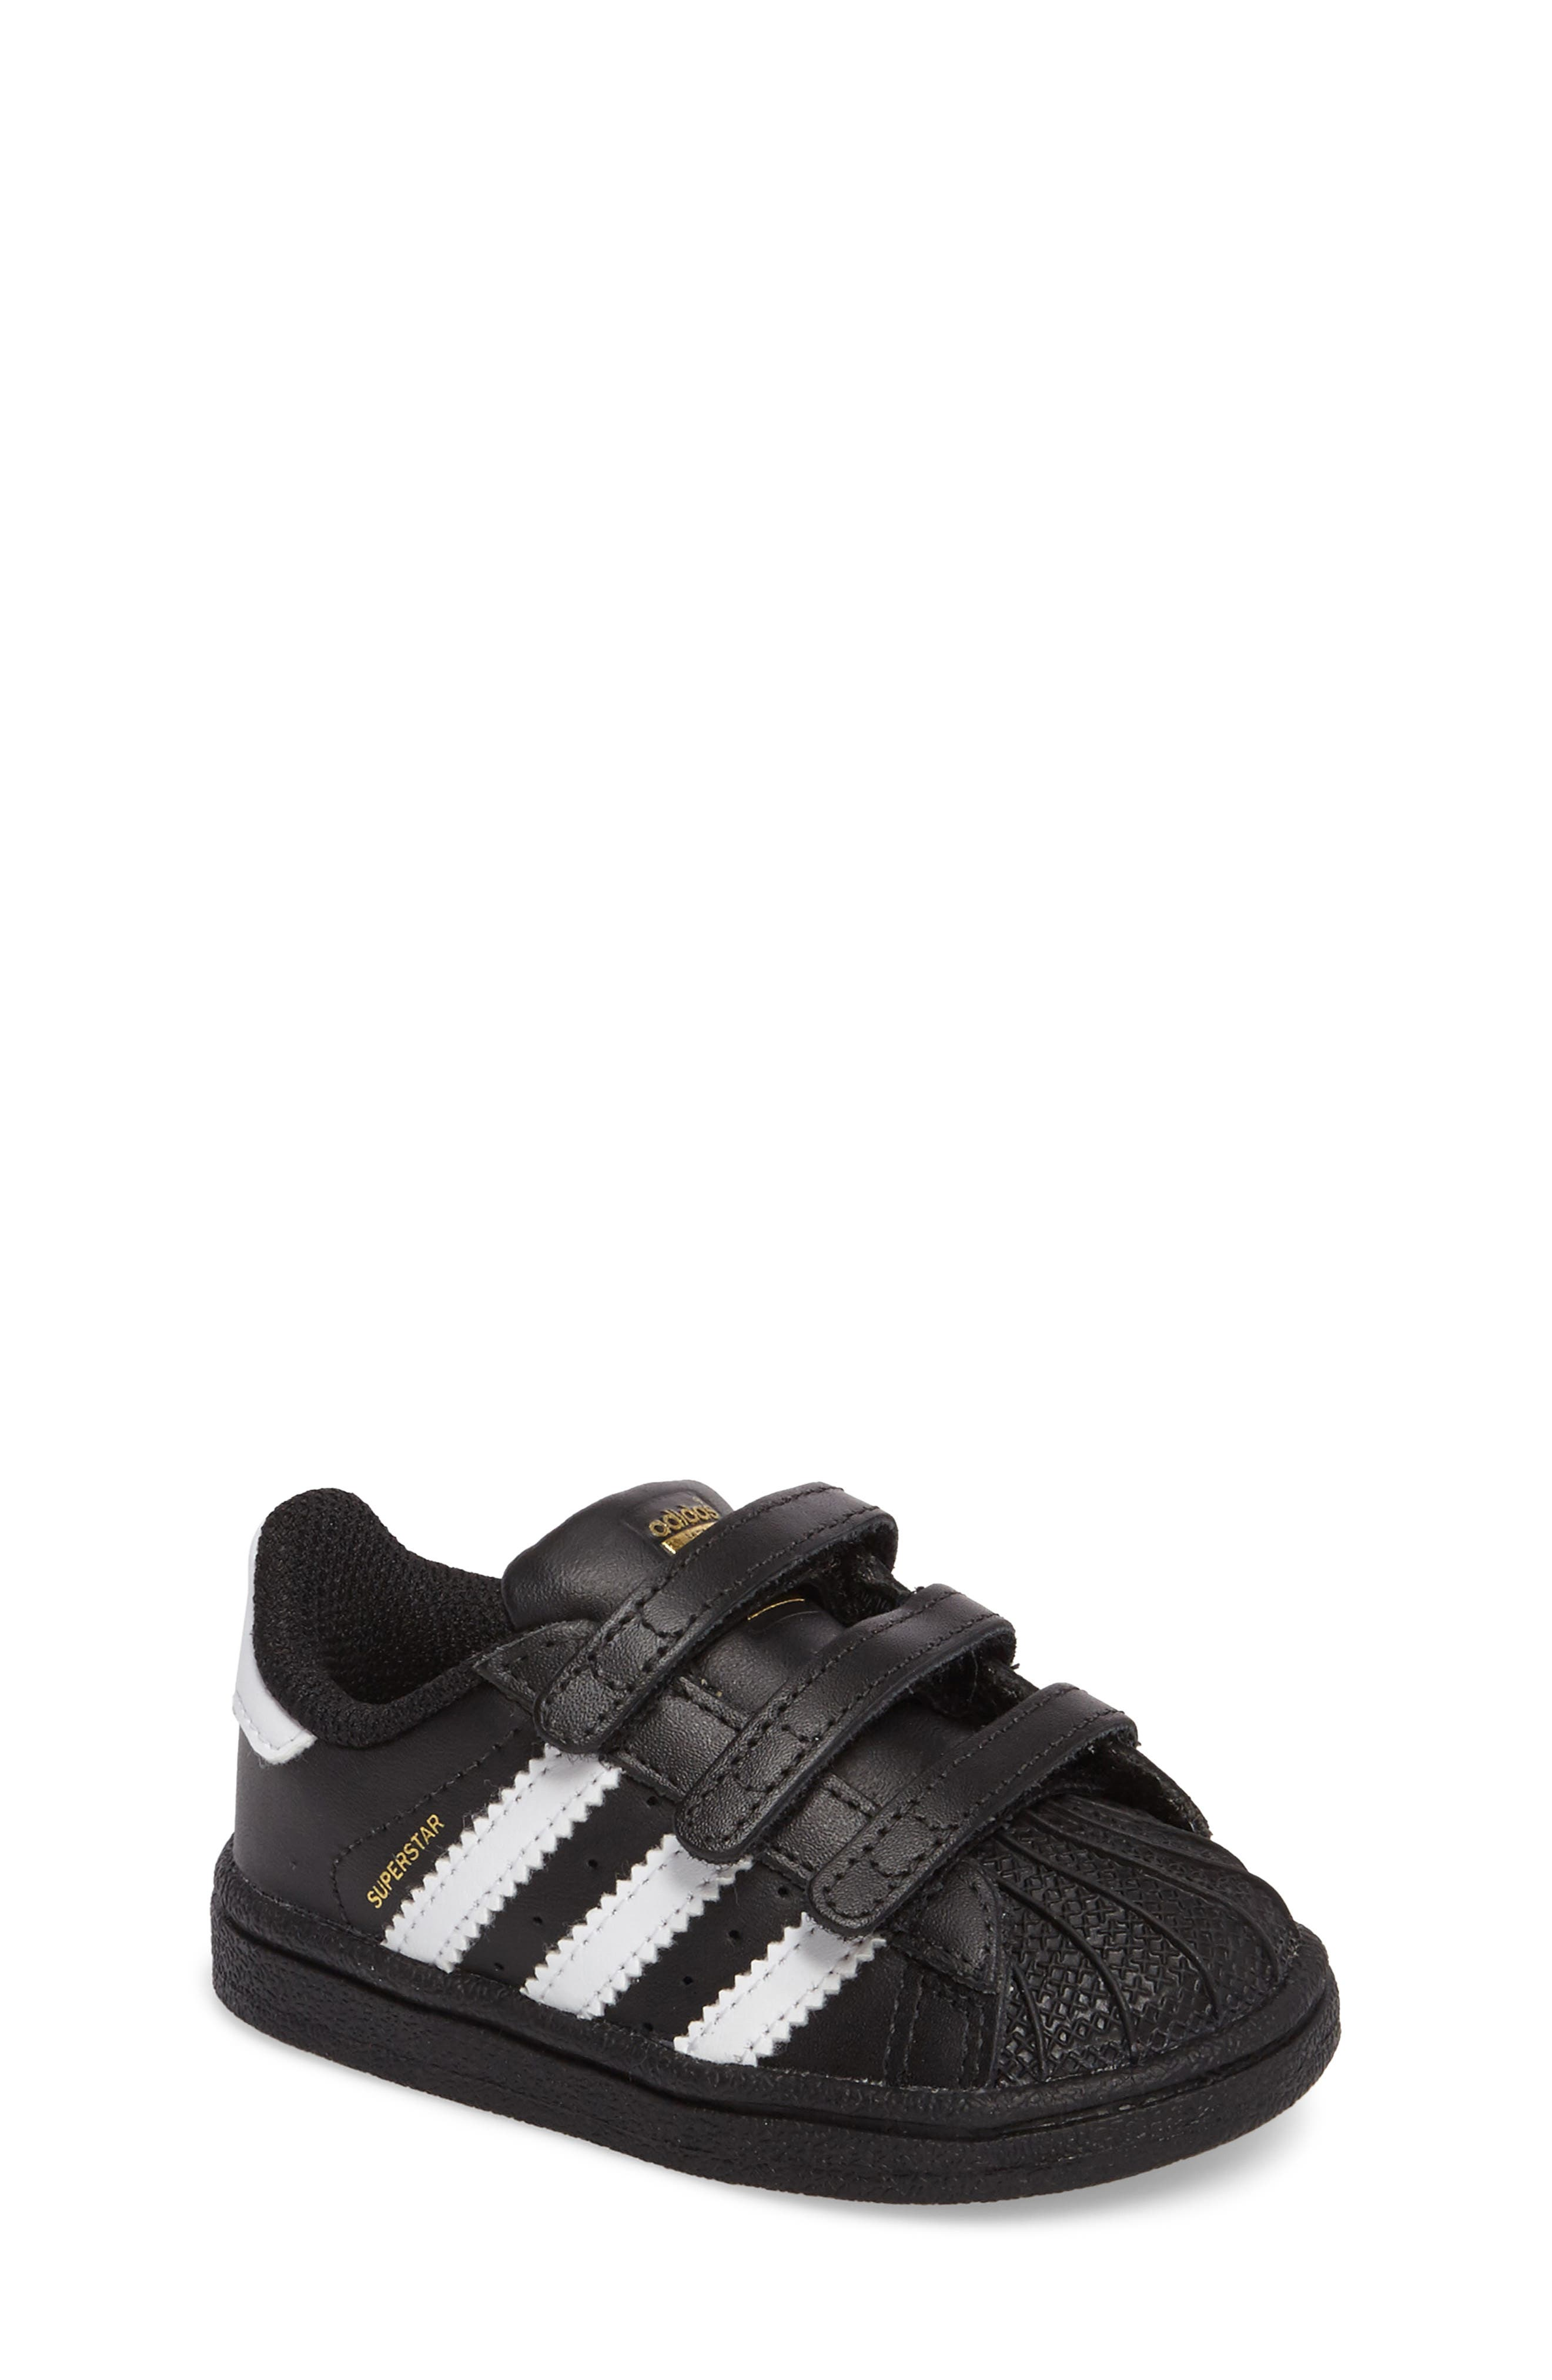 Superstar Sneaker,                         Main,                         color,